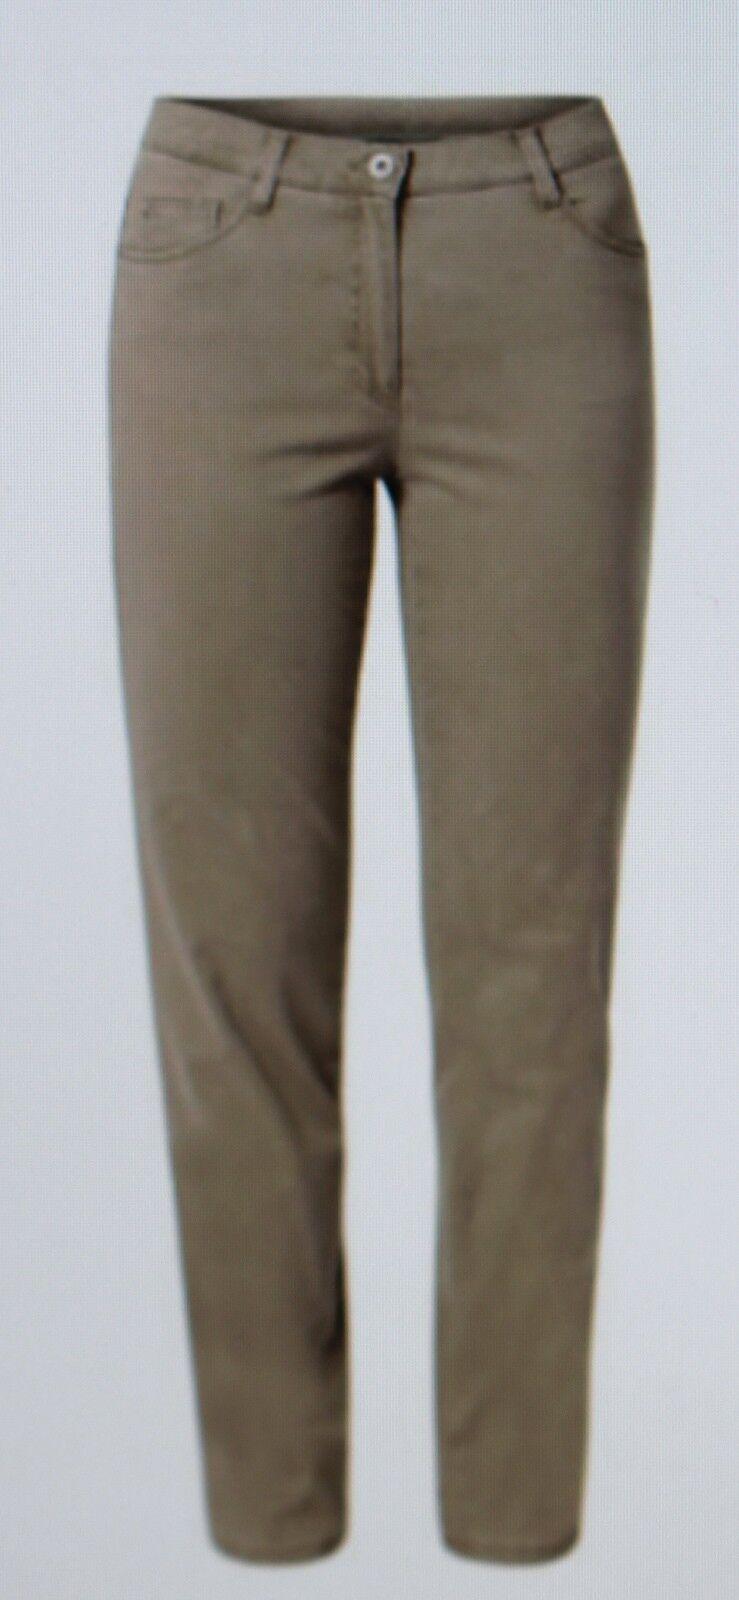 Pantalones Vaqueros de women Brax Beige Arena Modelo Carola Tamaño 40